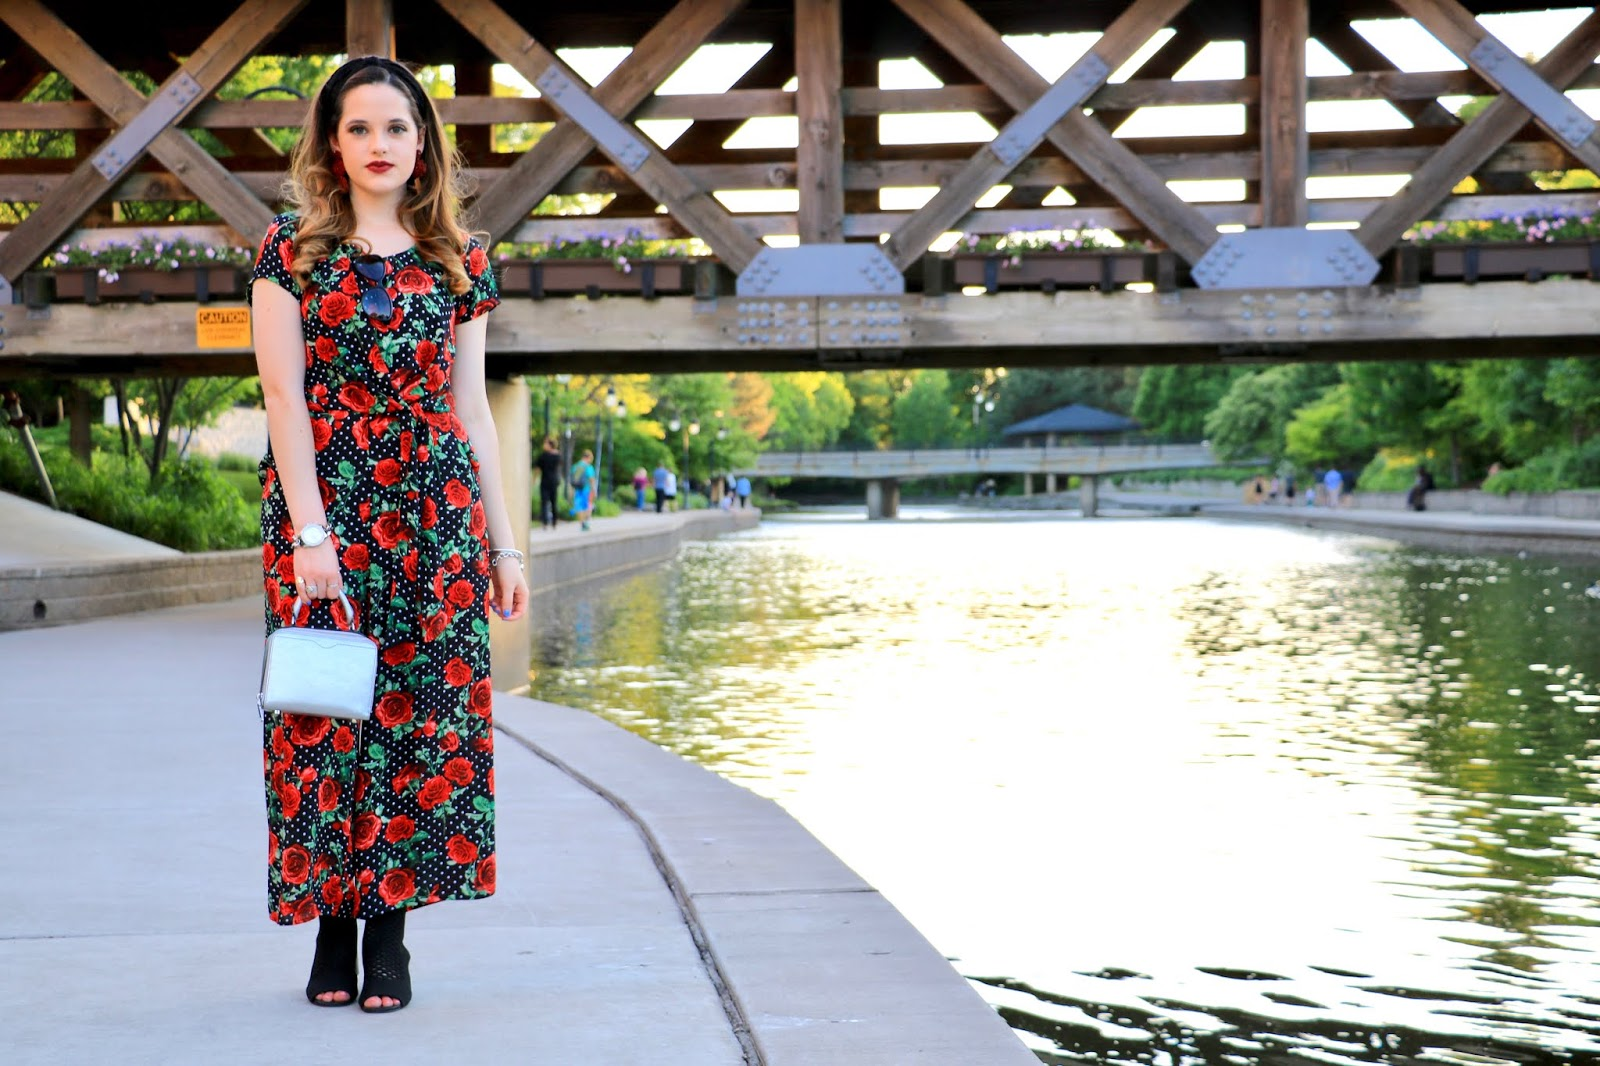 Nyc fashion blogger Kathleen Harper's Naperville Illinois photo shoot spots